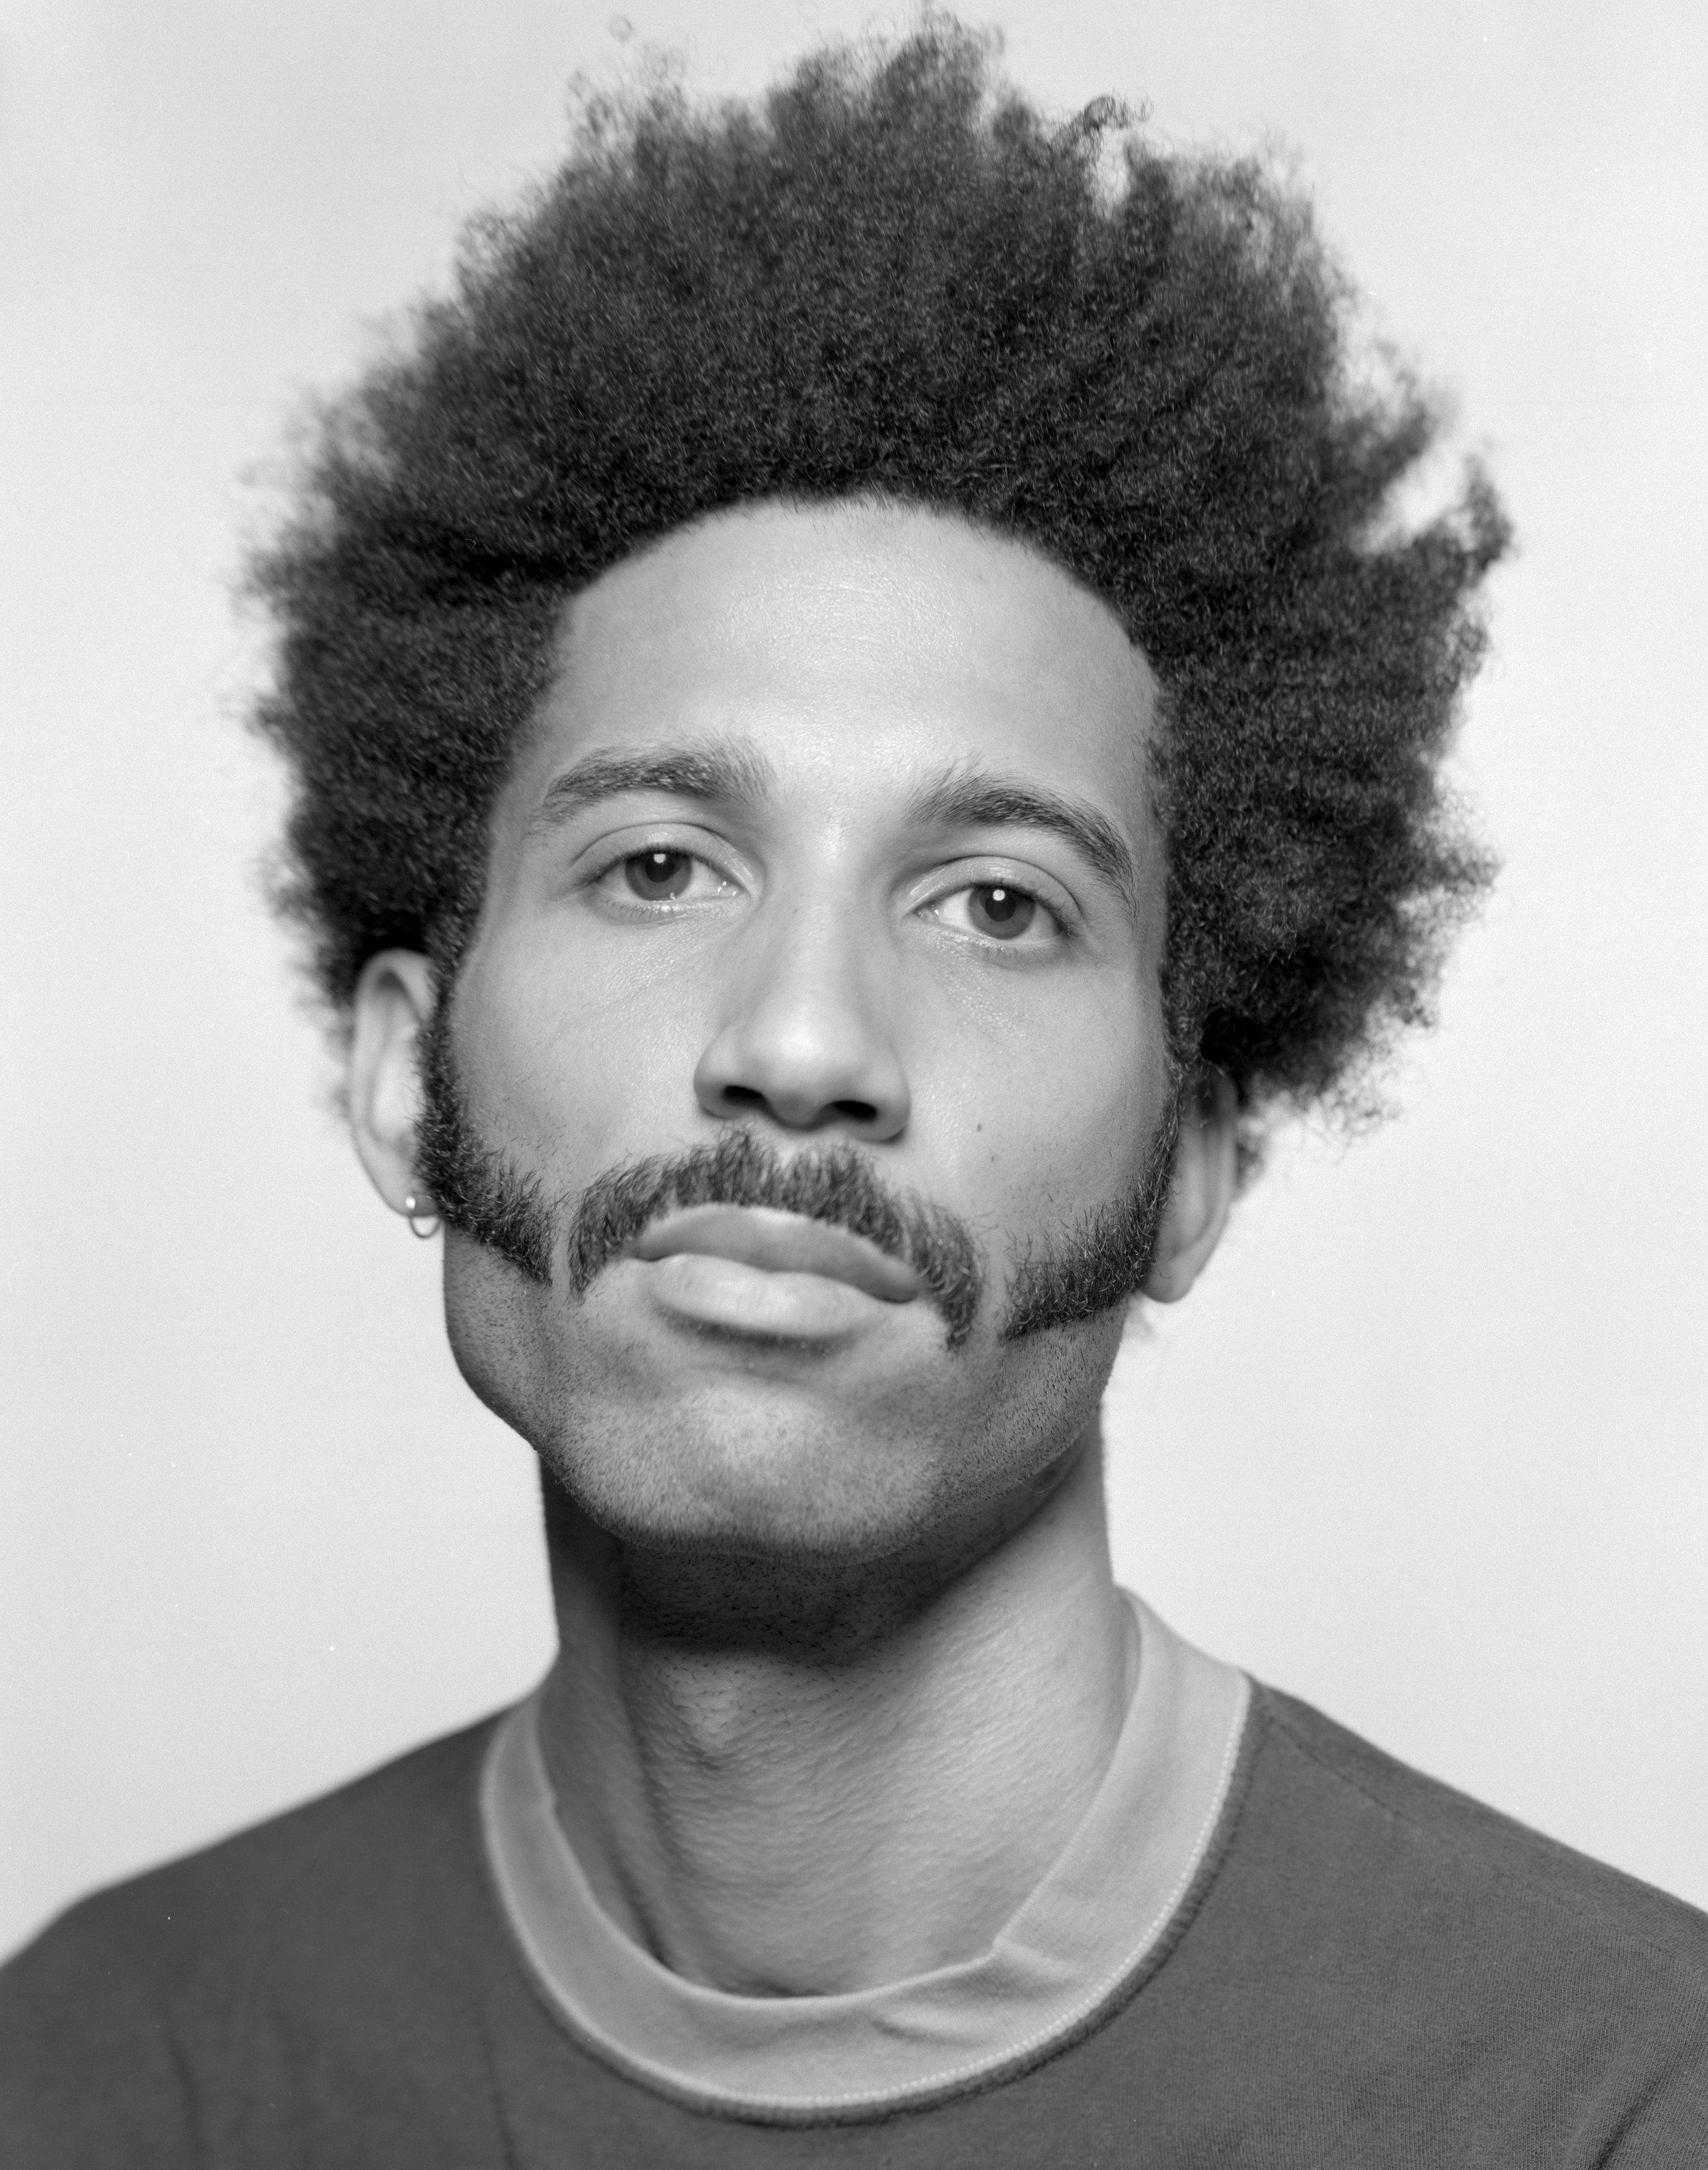 Portrait by Harrison Glazier, styled by James Flemons